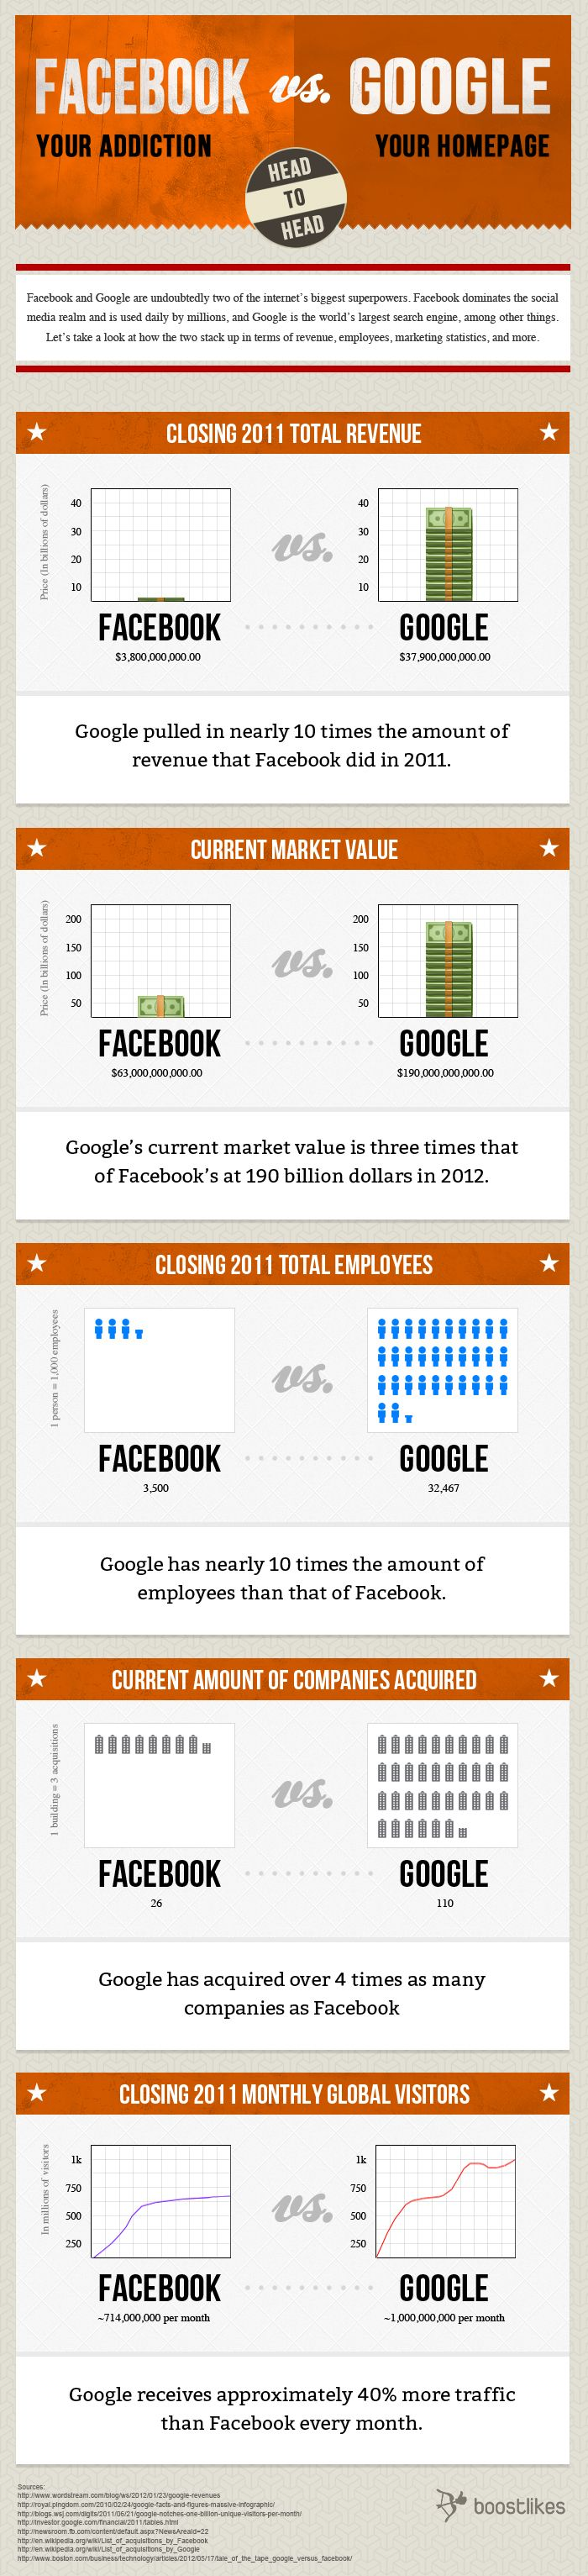 [Infographic] Facebook vs Google